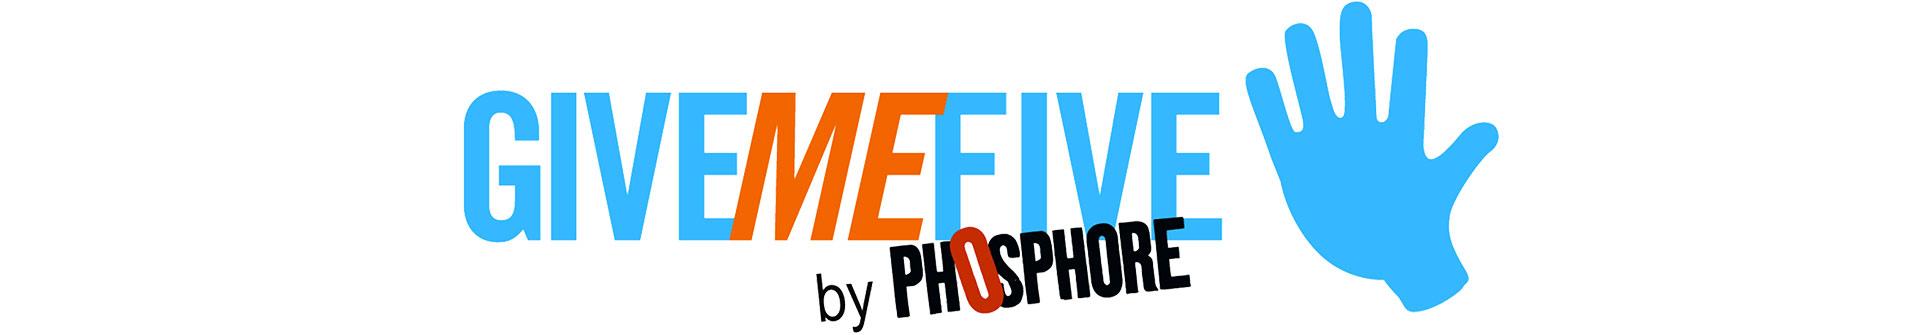 logo Give me five